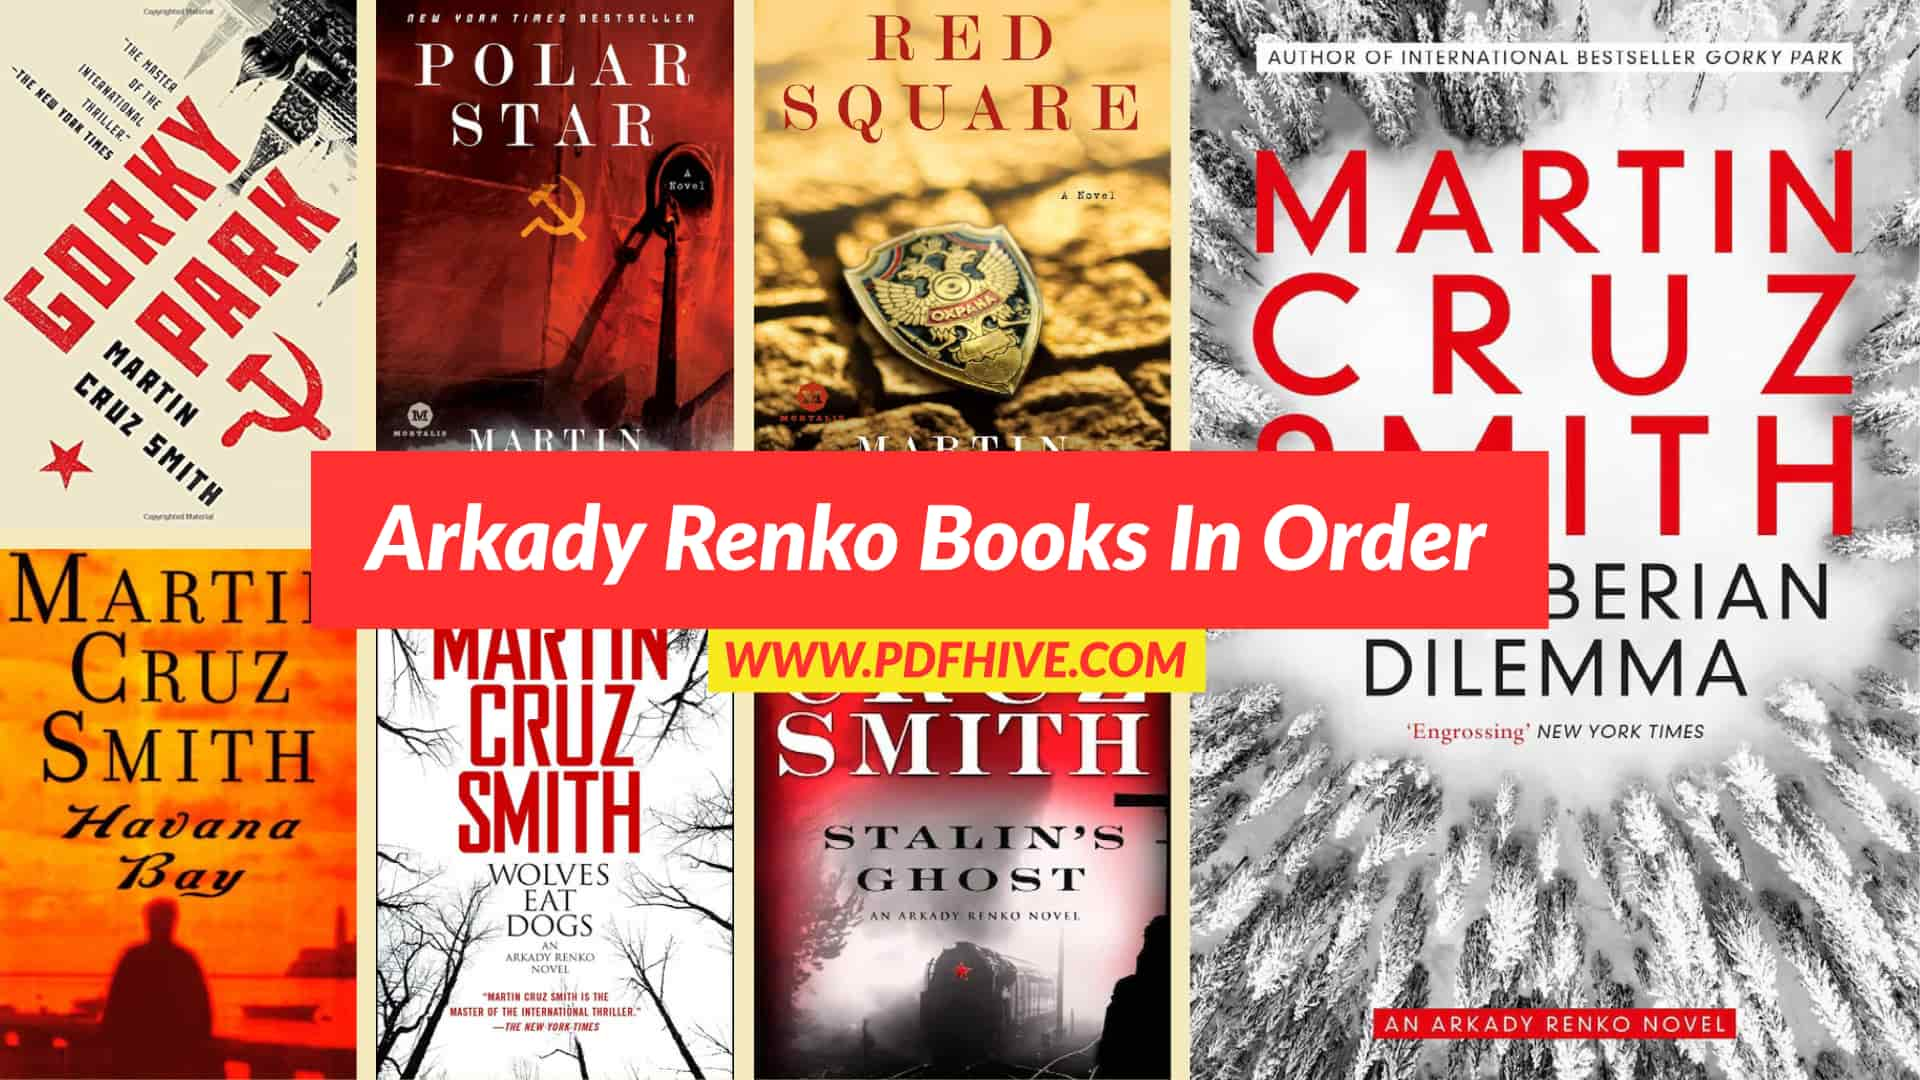 Arkady Renko Books In Order – Martin Cruz Smith